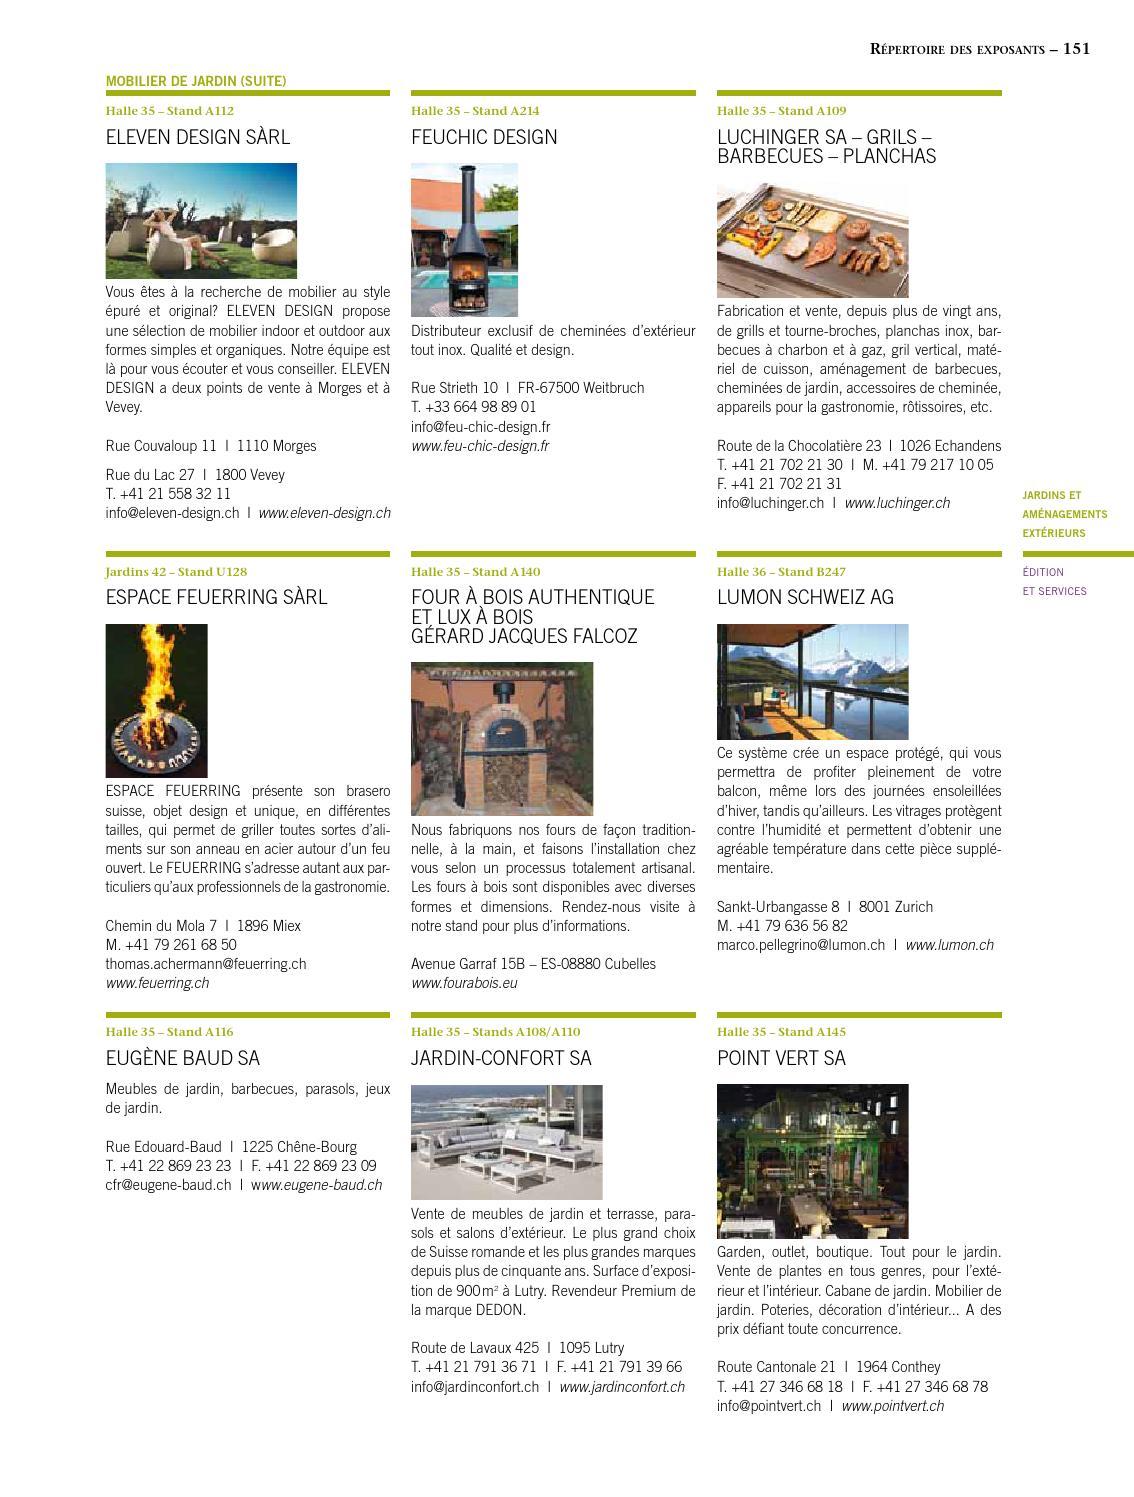 Prix Cheminee Exterieur Feu Chic Design habitat-jardin 2015 magazineinédit publications sa - issuu